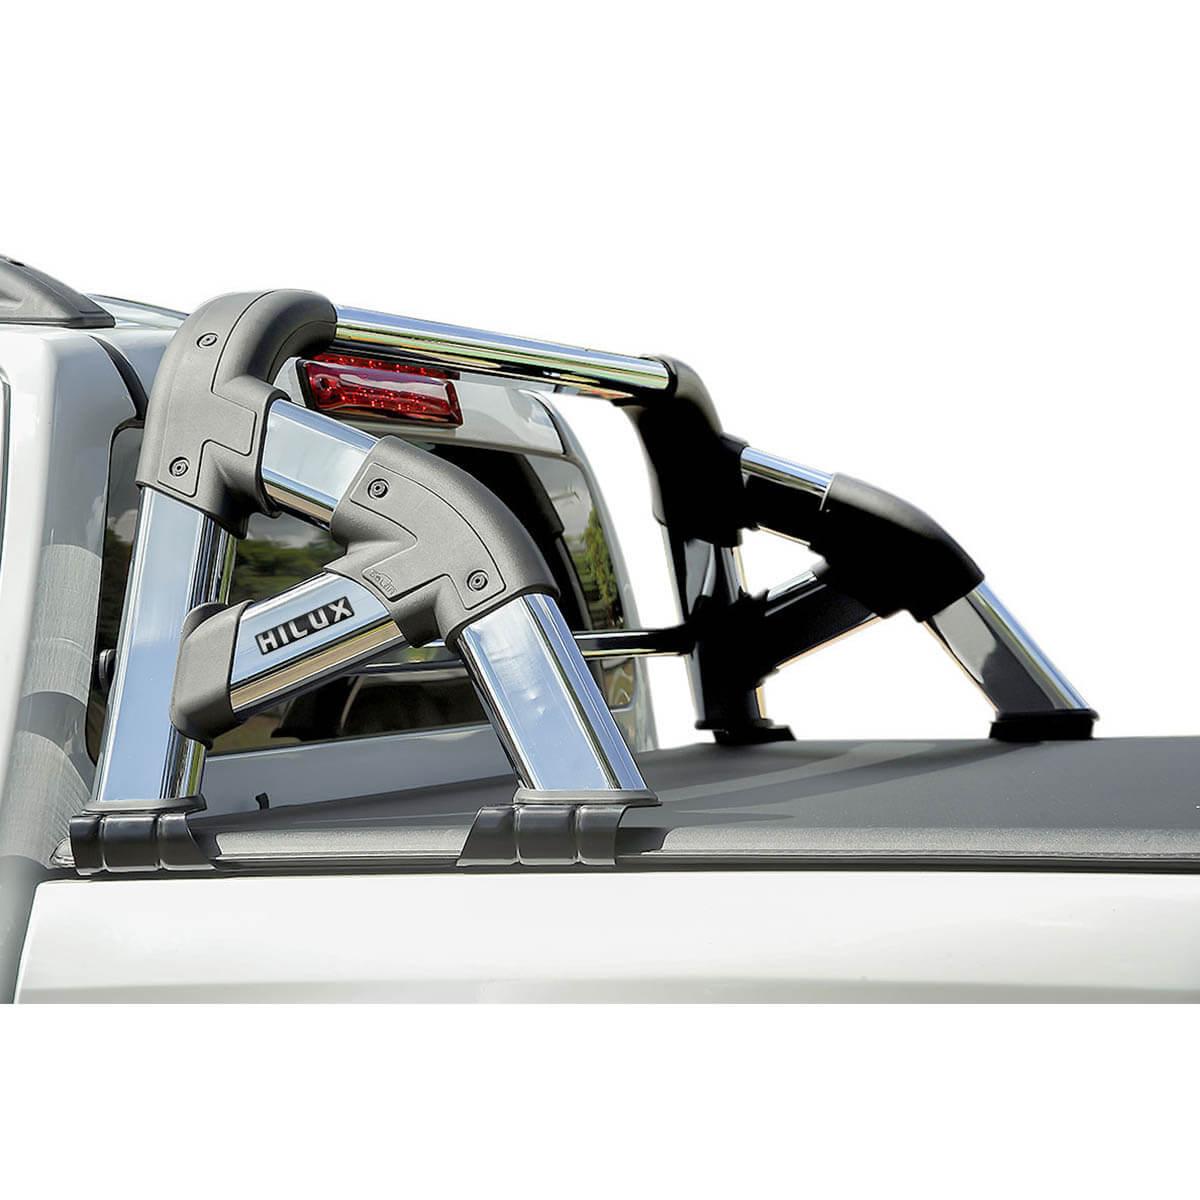 Santo antônio cromado Solar Exclusive Nova Hilux 2016 a 2021 com barra de vidro